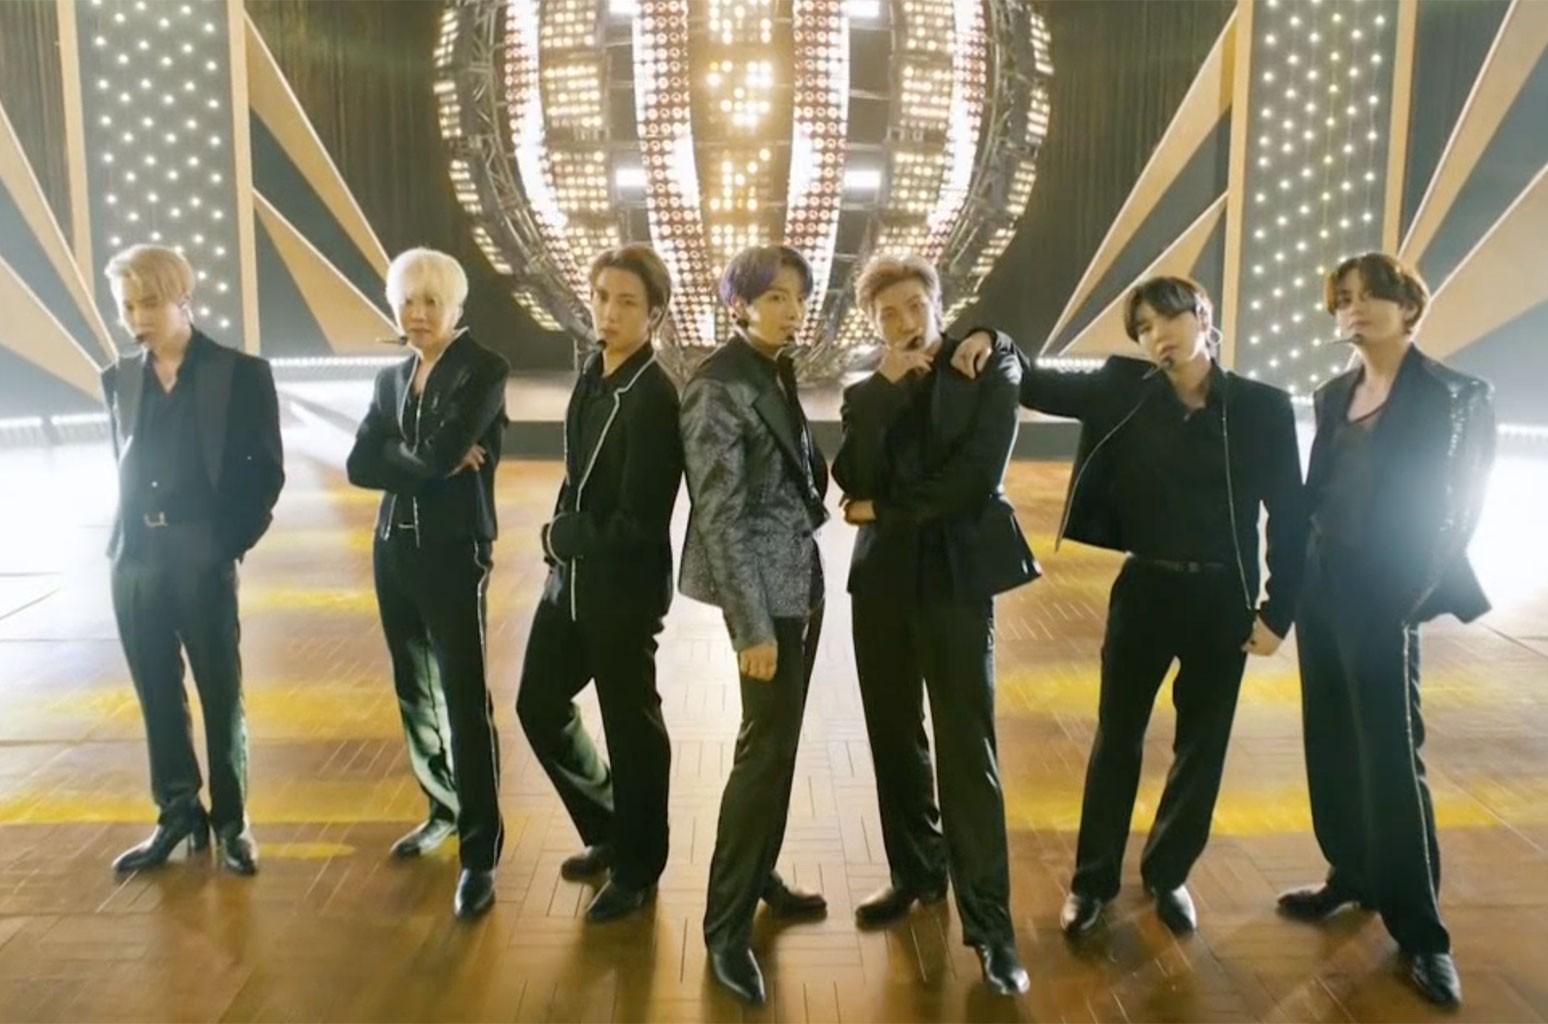 Smooth Start: BTS' 'Butter' Blasts In at No. 1 on Billboard Hot 100 – Billboard